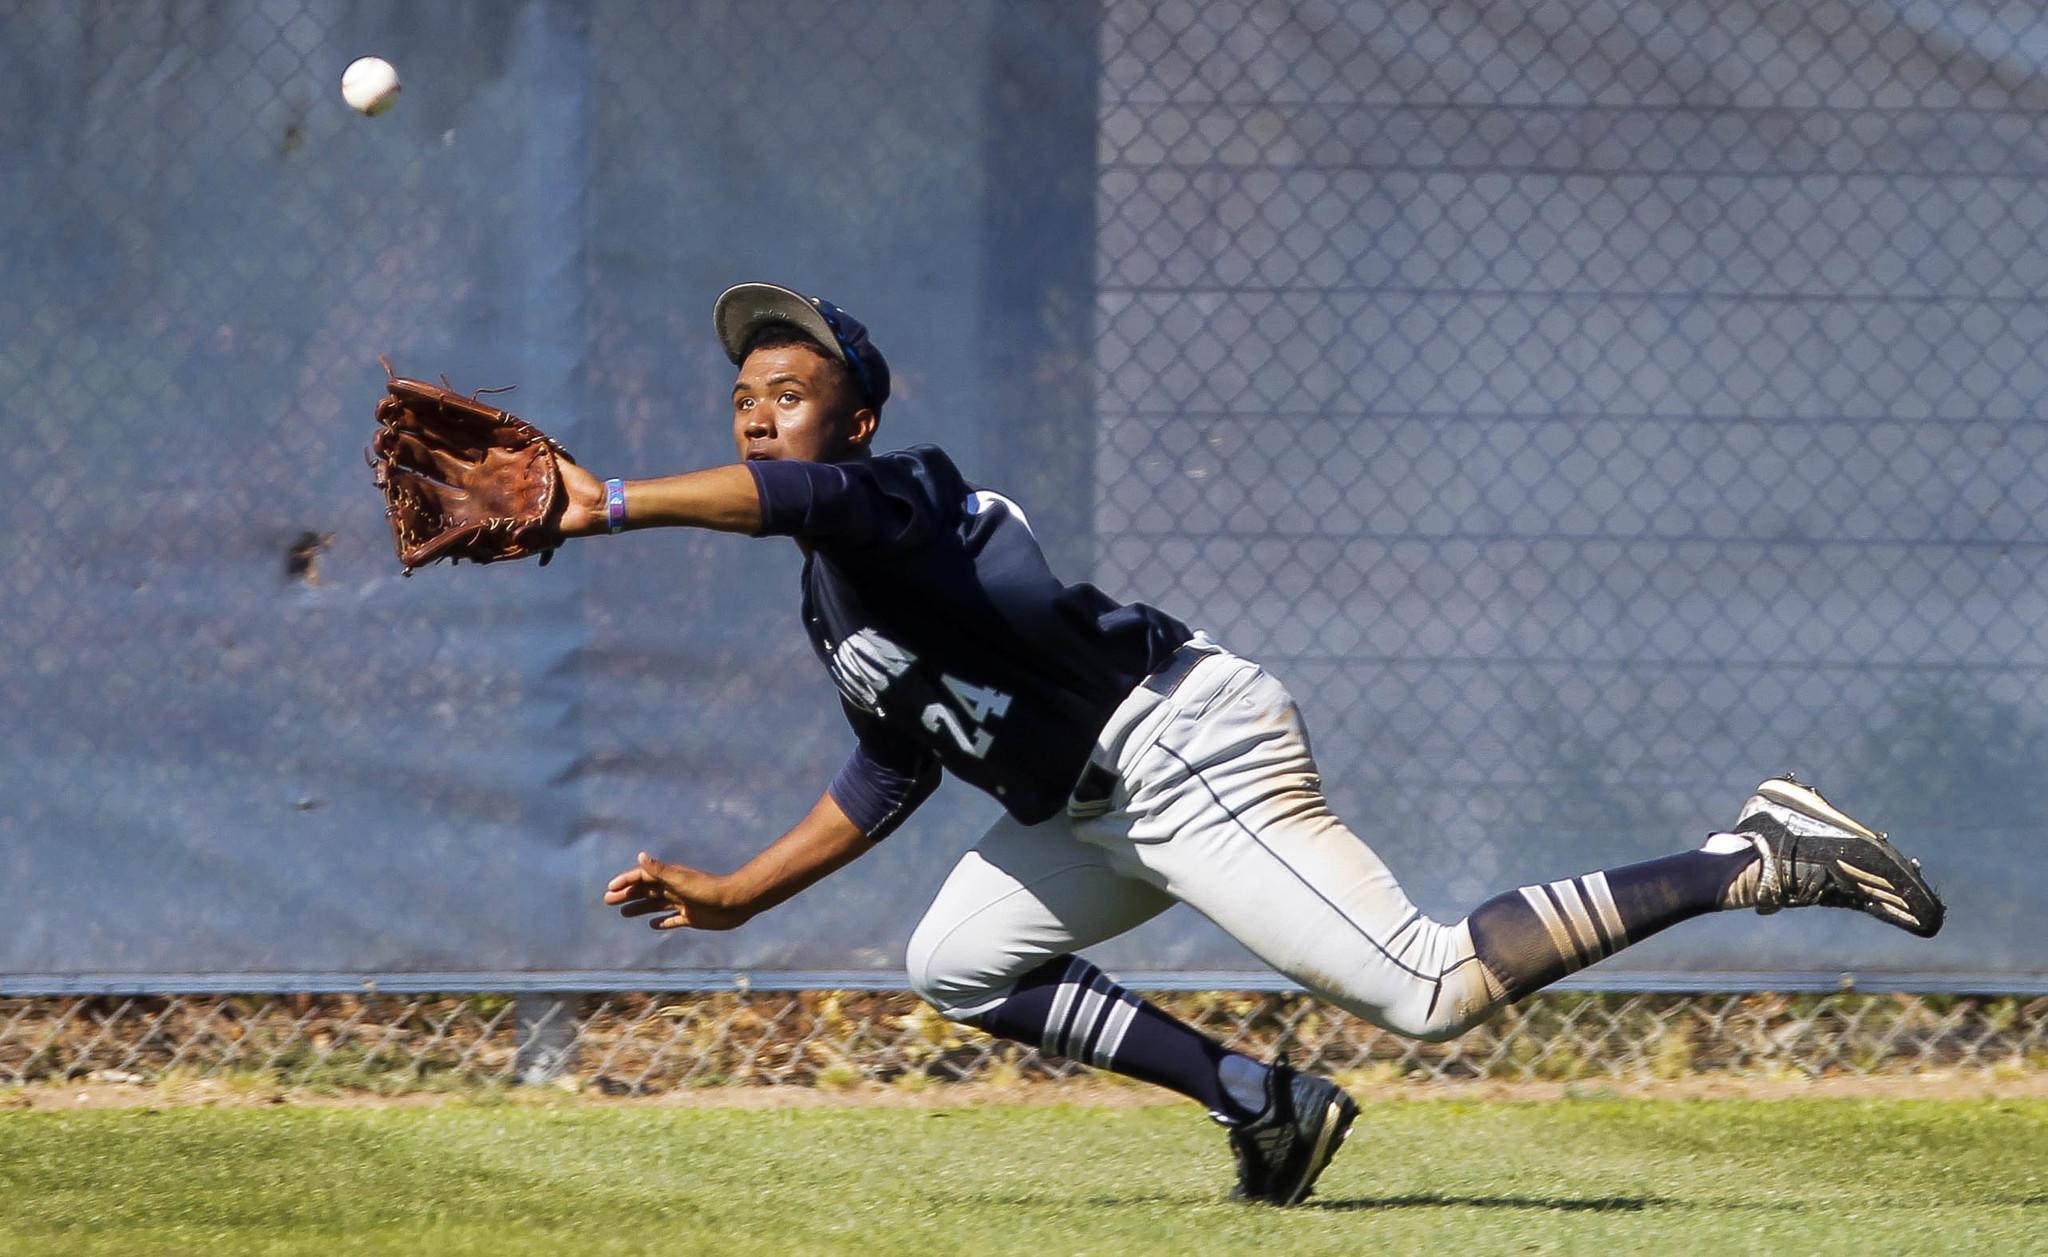 San Diego Mercedes >> Union-Tribune honors 7,844 student-athletes - The San Diego Union-Tribune